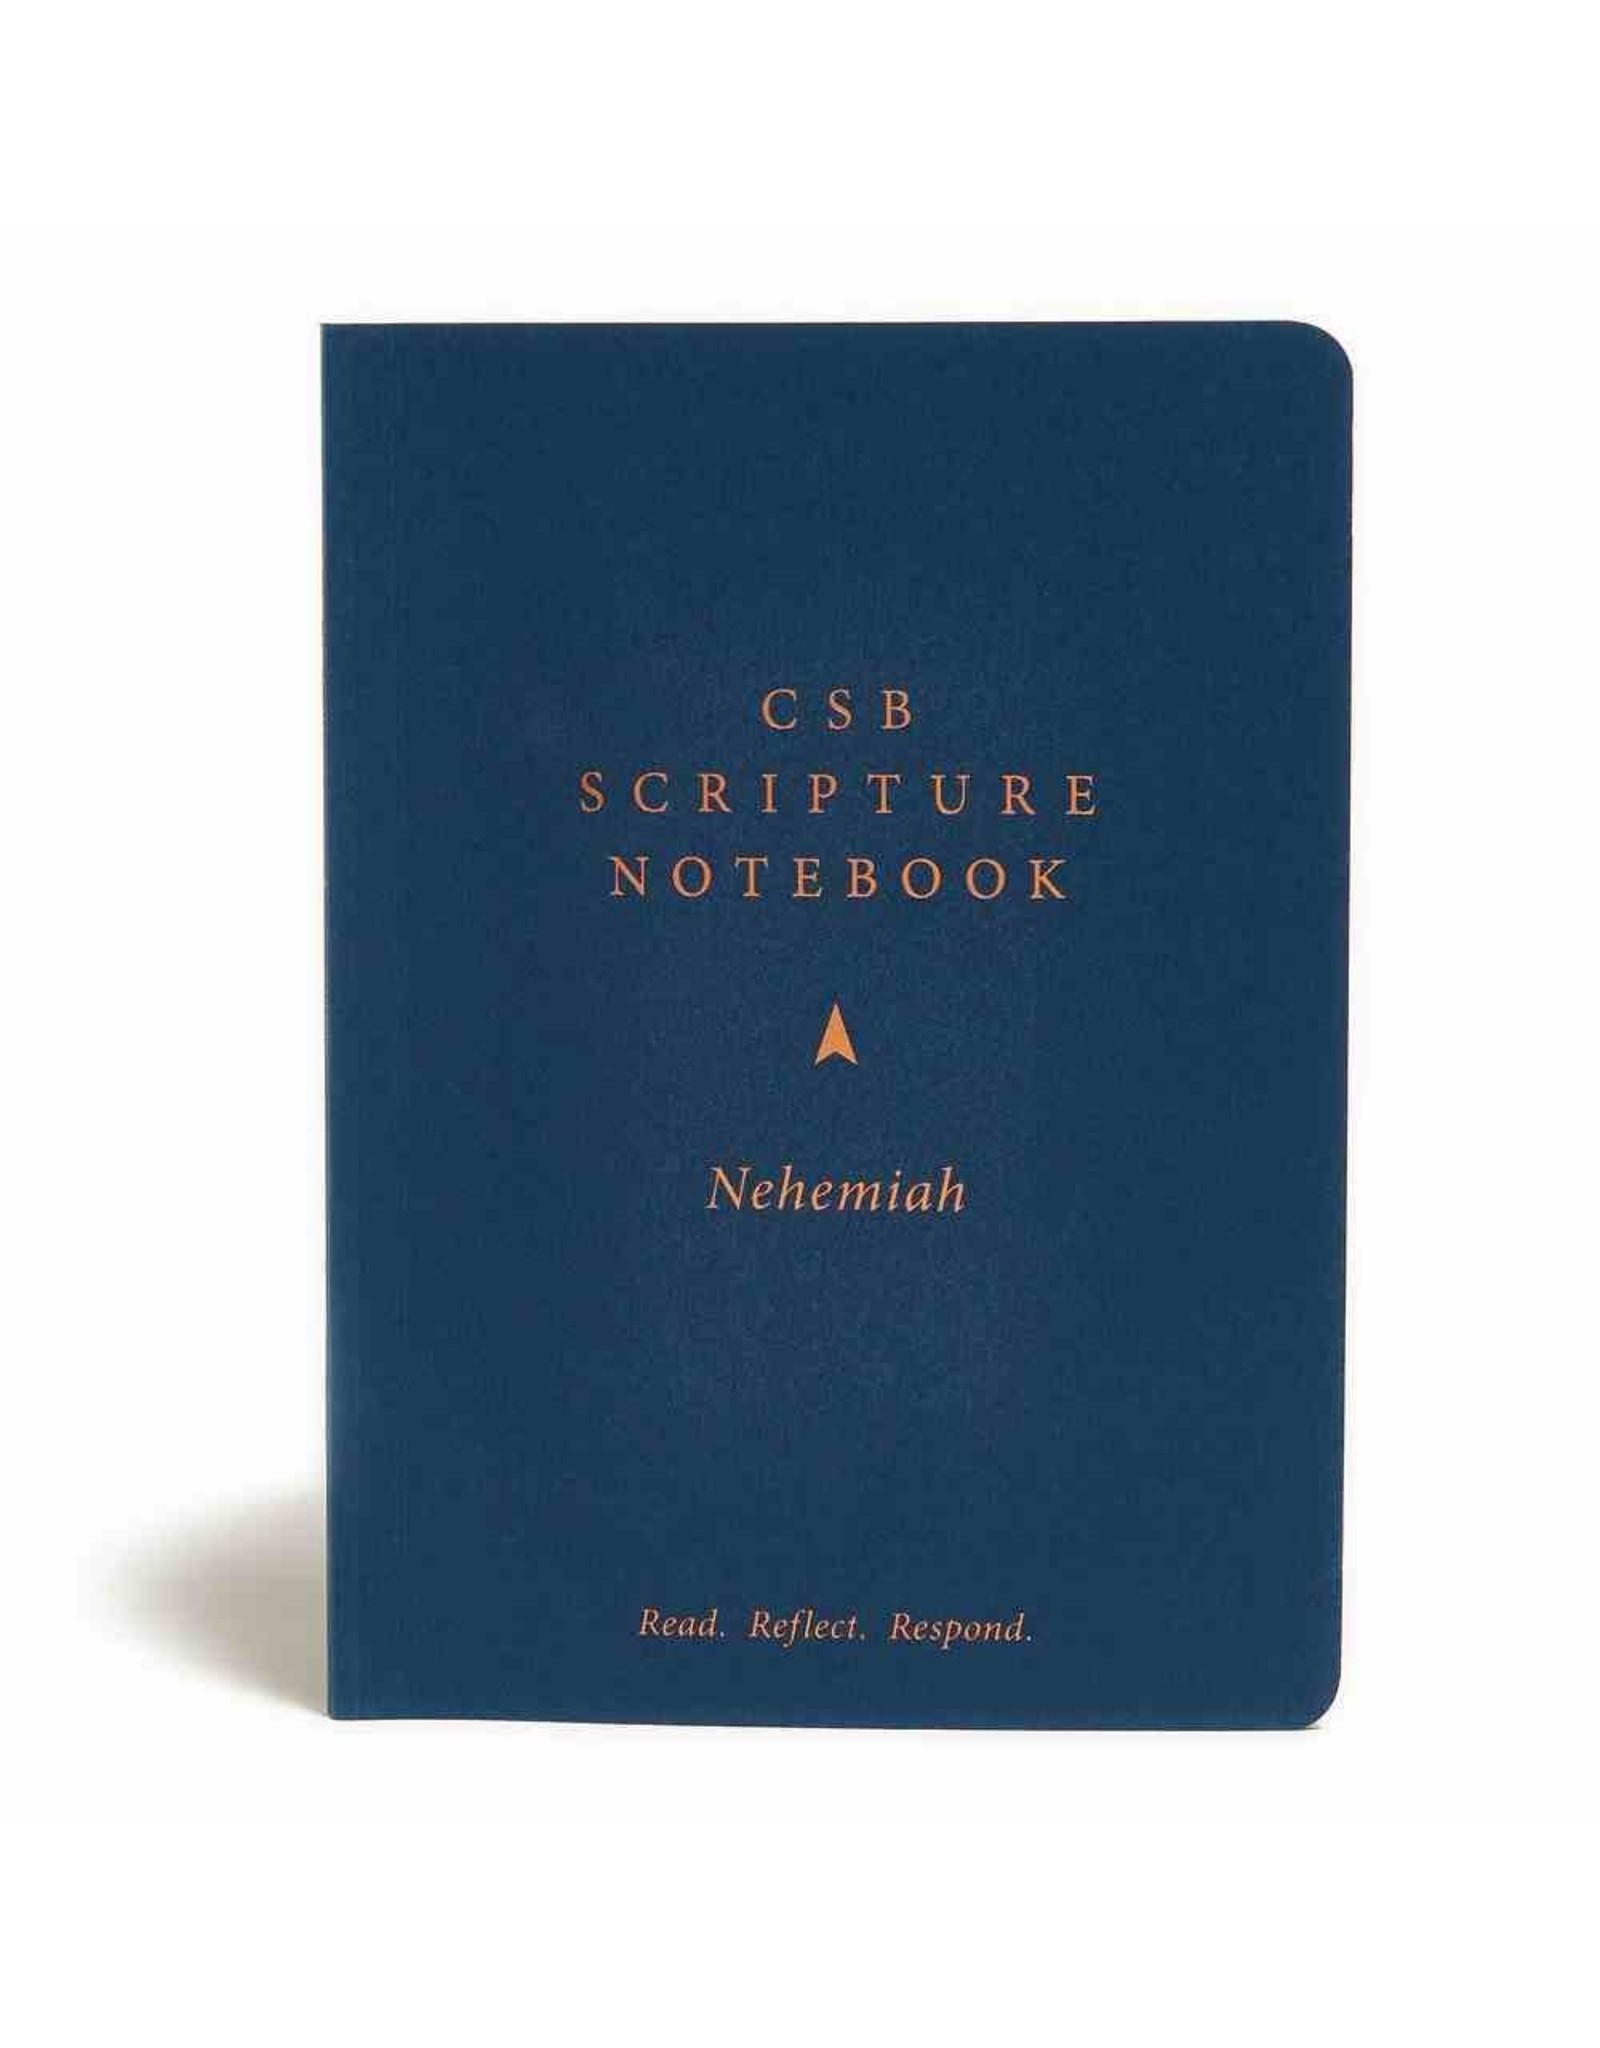 Holman CSB Scripture Notebook - Nehemiah